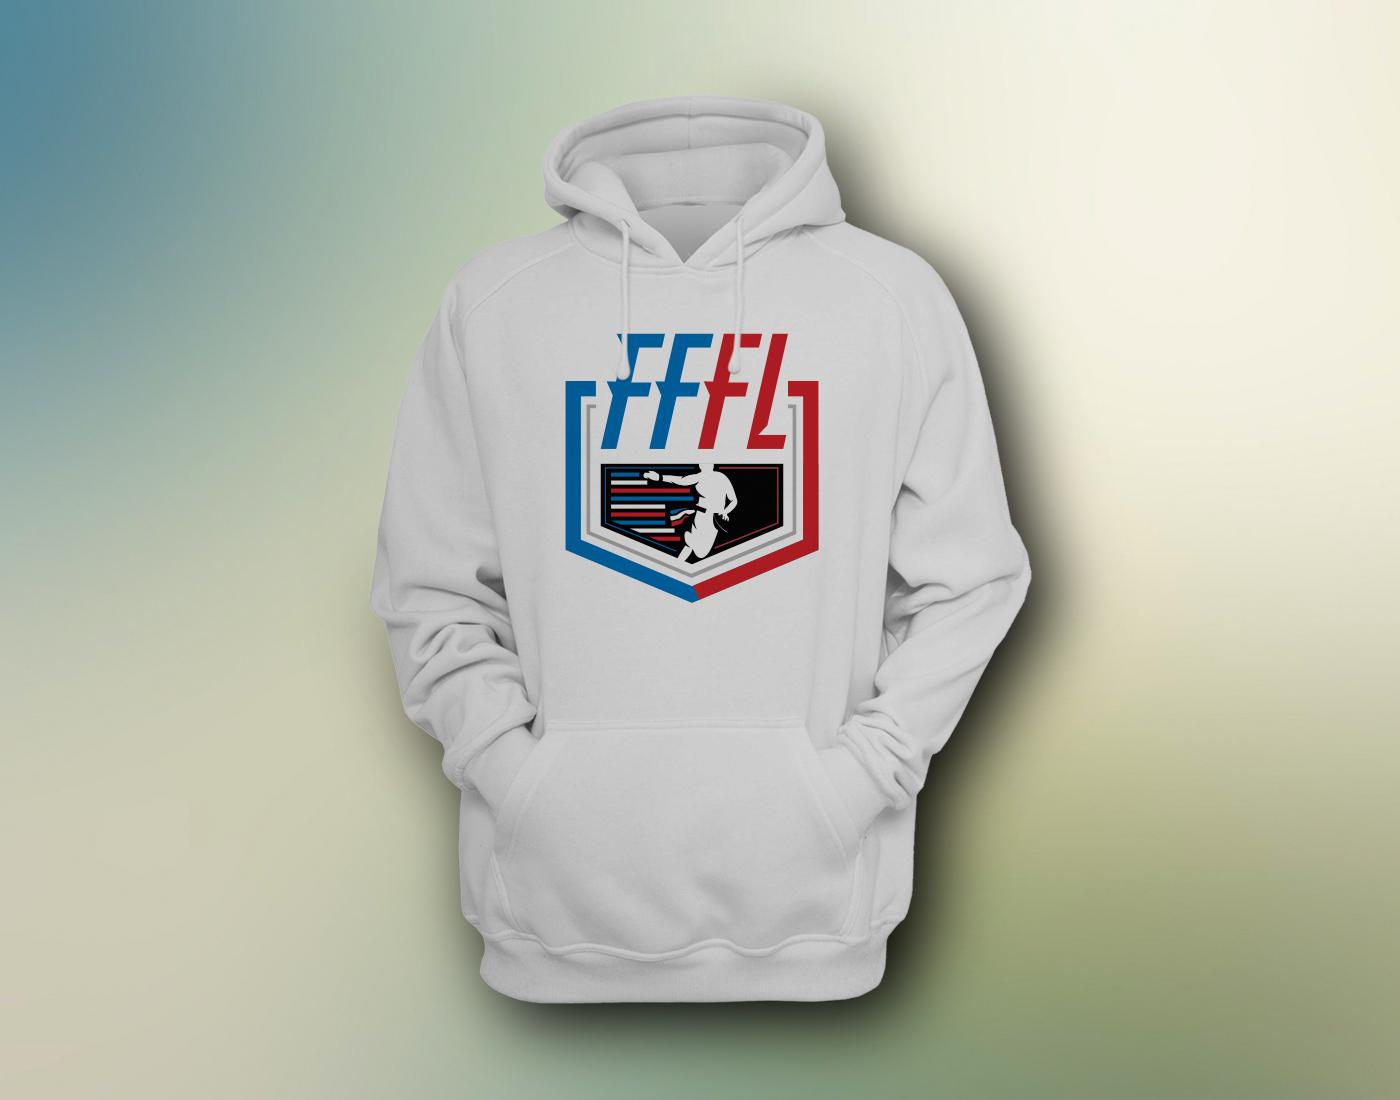 FFFL-sweetshirt